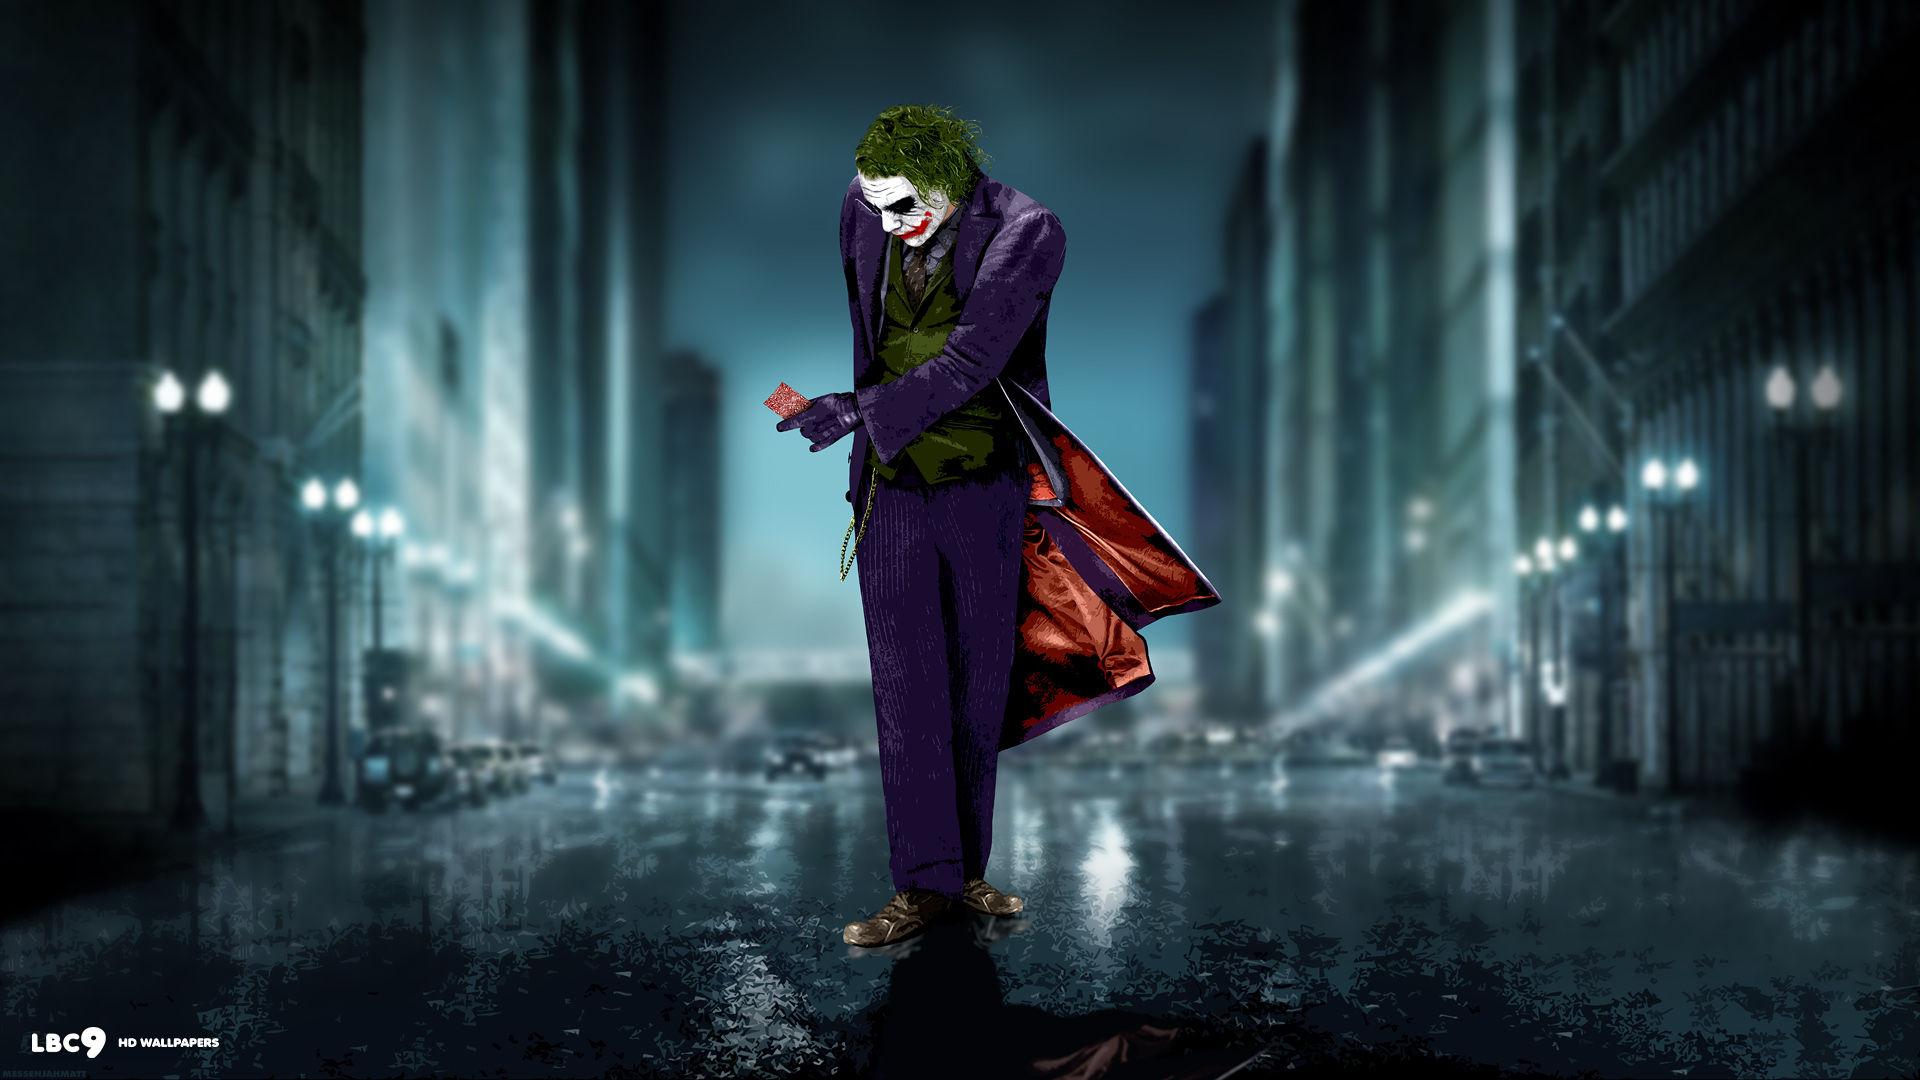 Collection of Batman Dark Knight Joker Wallpaper on HDWallpapers